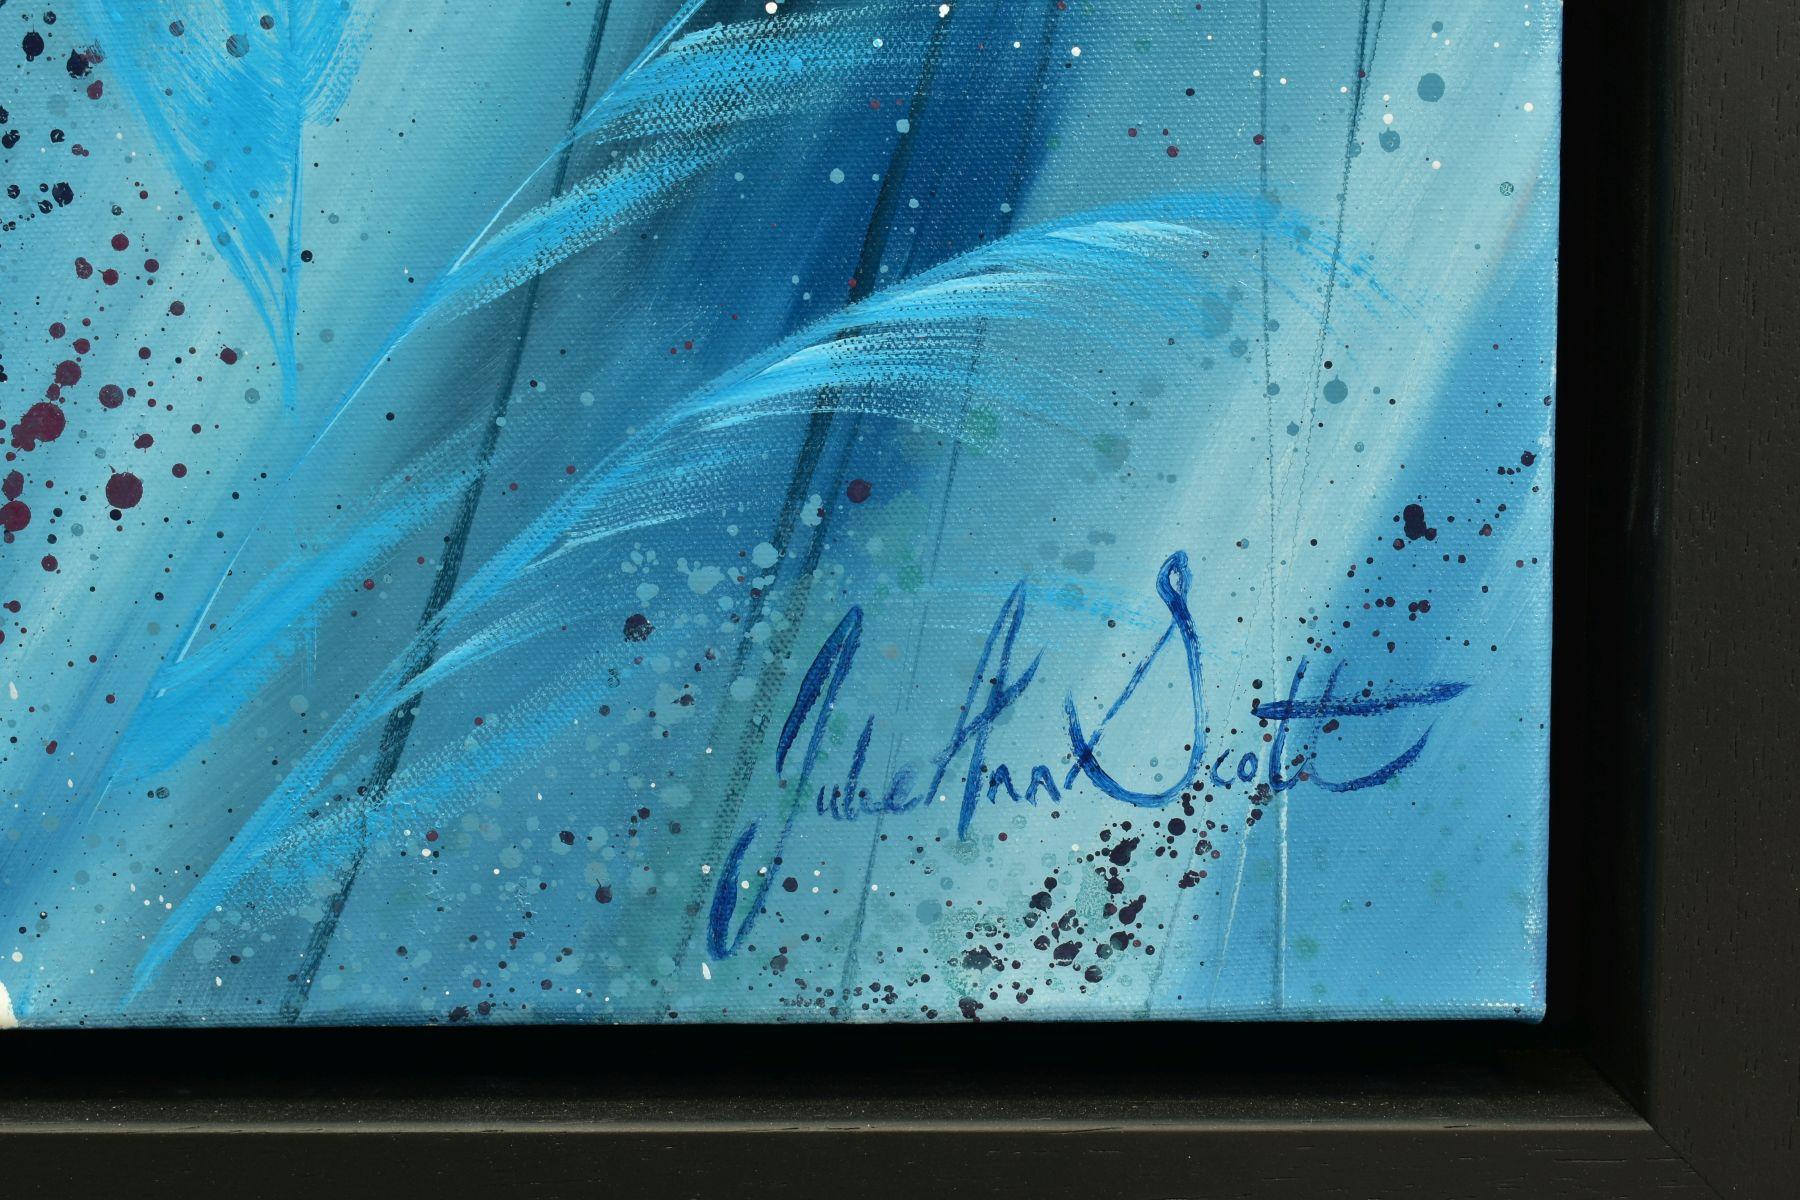 JULIE ANN SCOTT (BRITISH CONTEMPORARY), 'Home Spun Joy', wild flowers against a blue backdrop, - Image 4 of 7